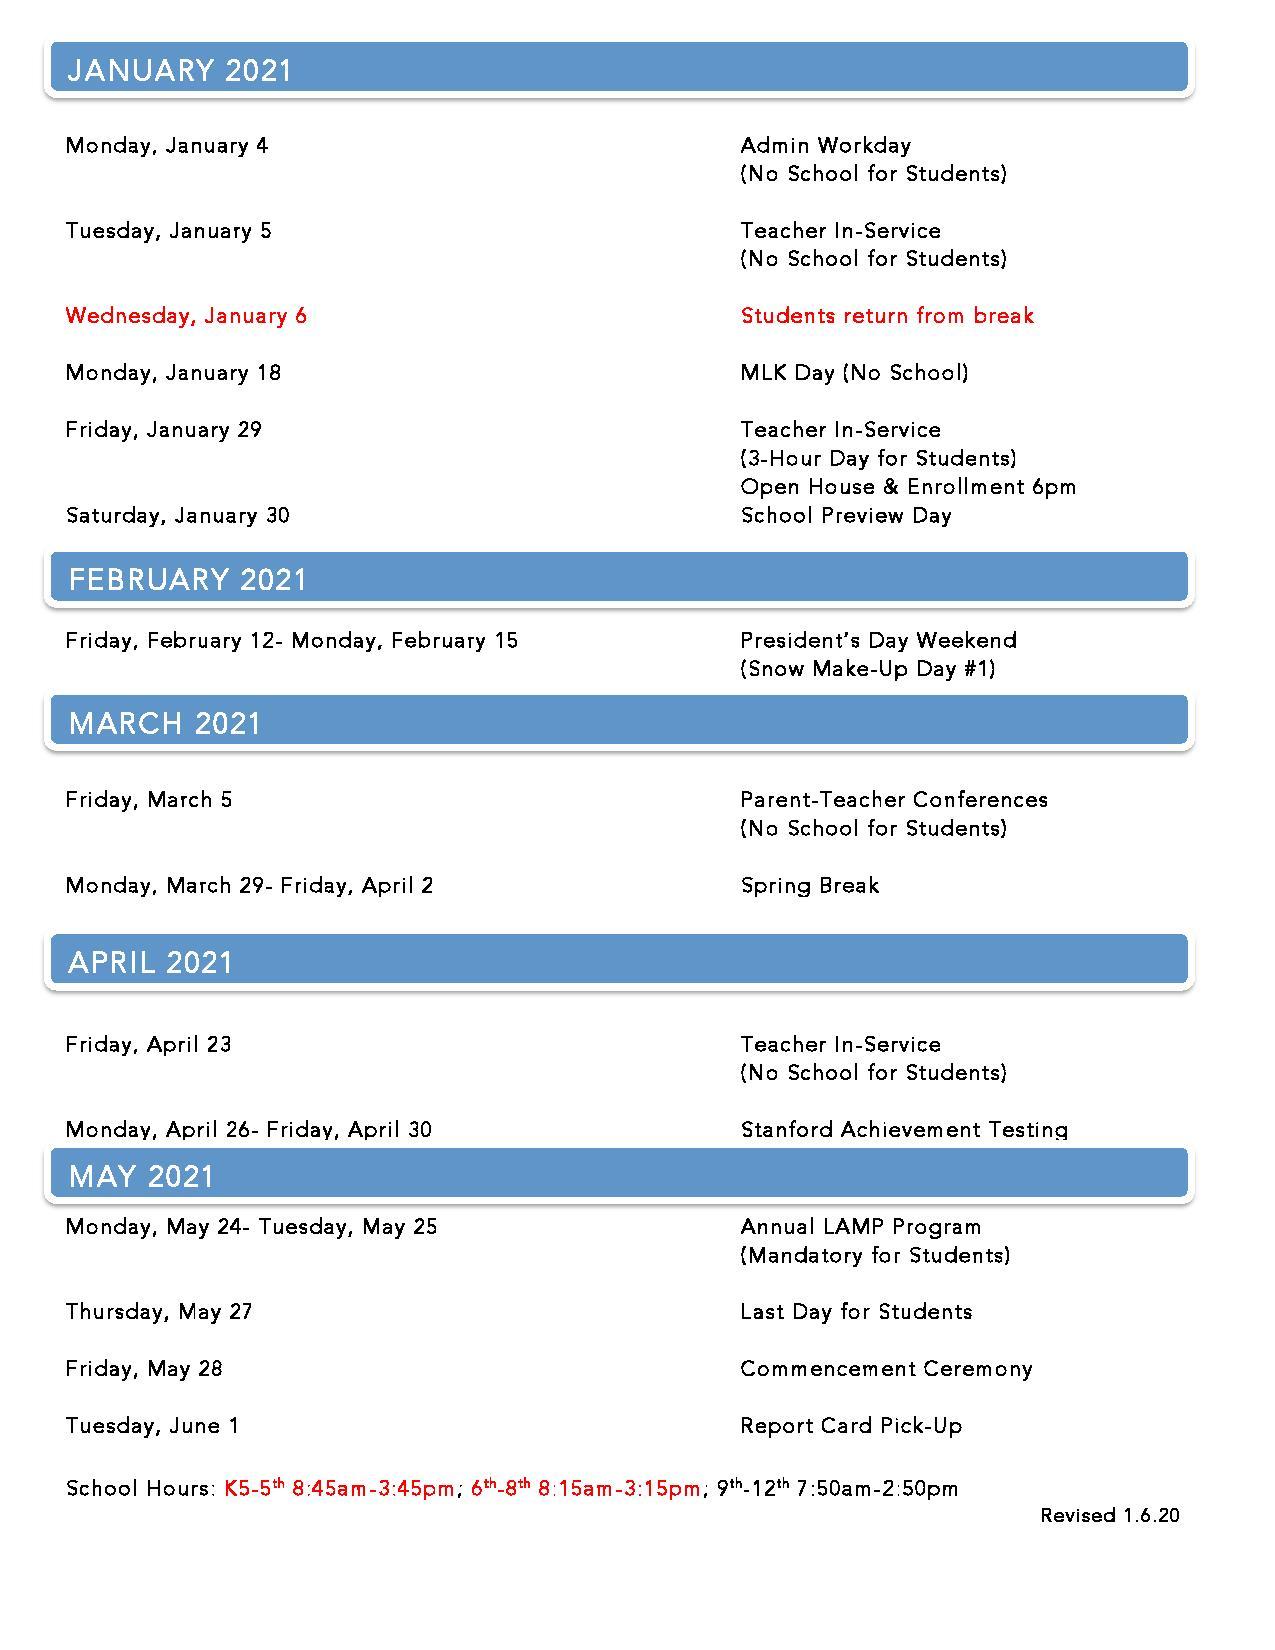 Lca Calendar For Davidson County Tn School Calendar 2021